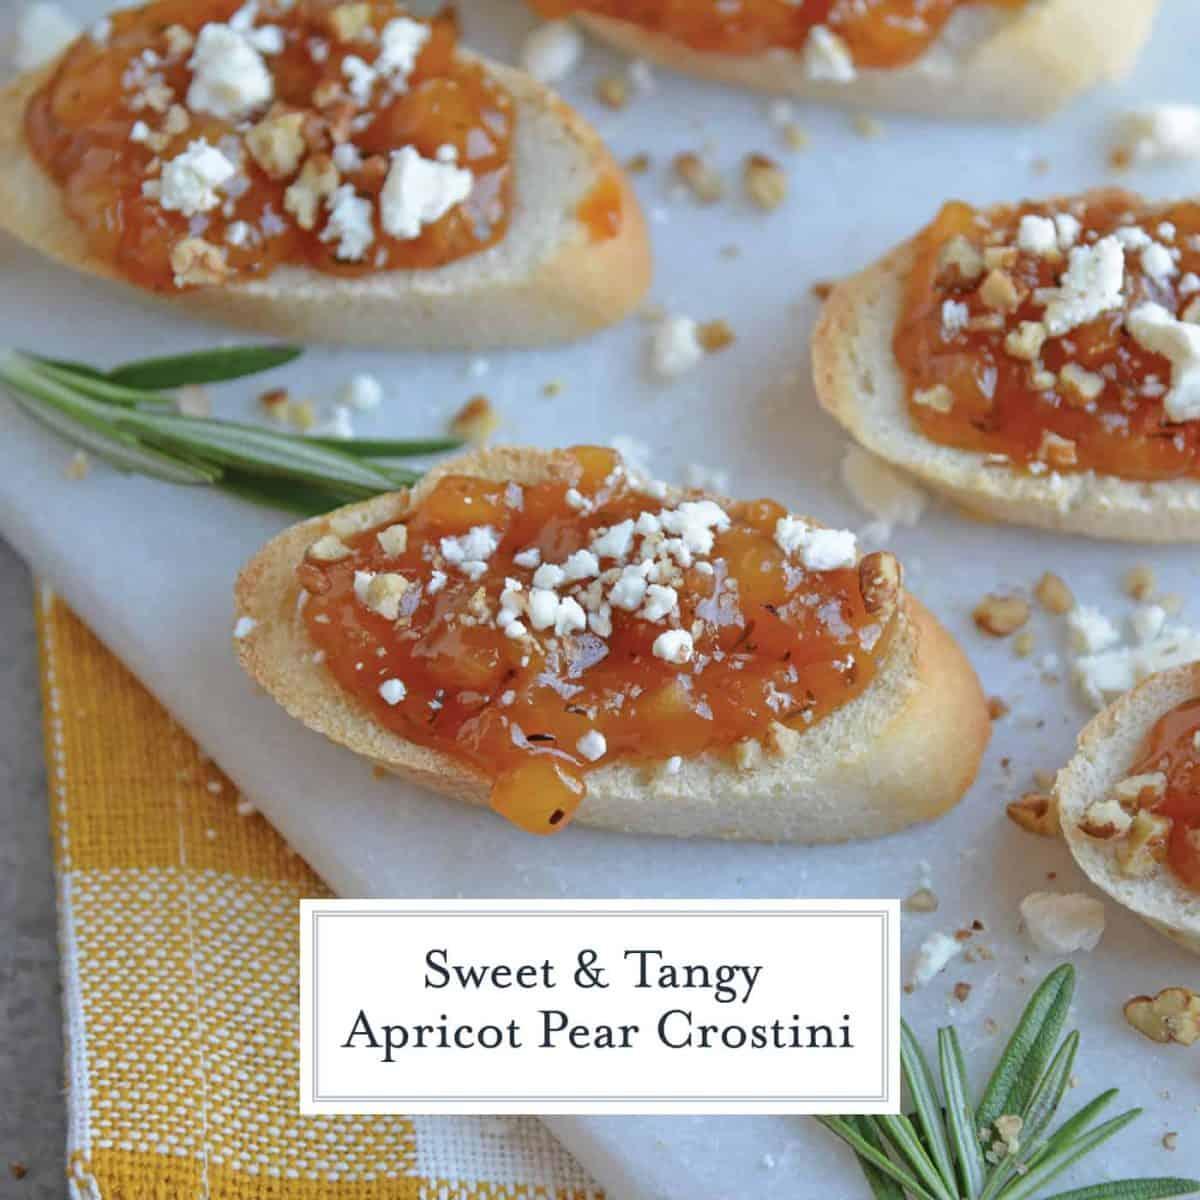 Apricot crostini